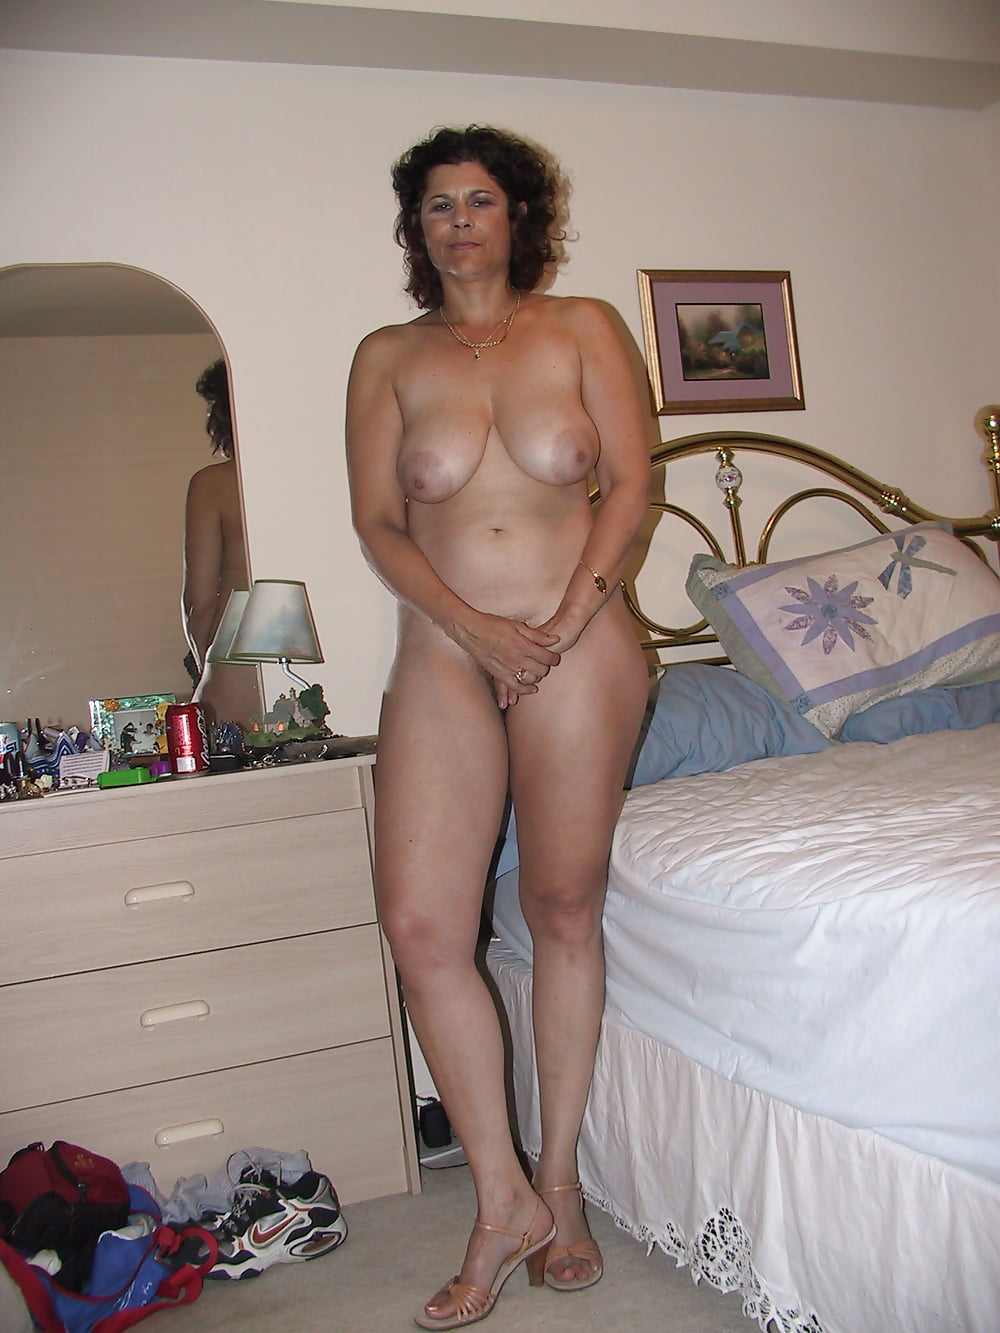 Single women seeking men in toronto, ontario, canada